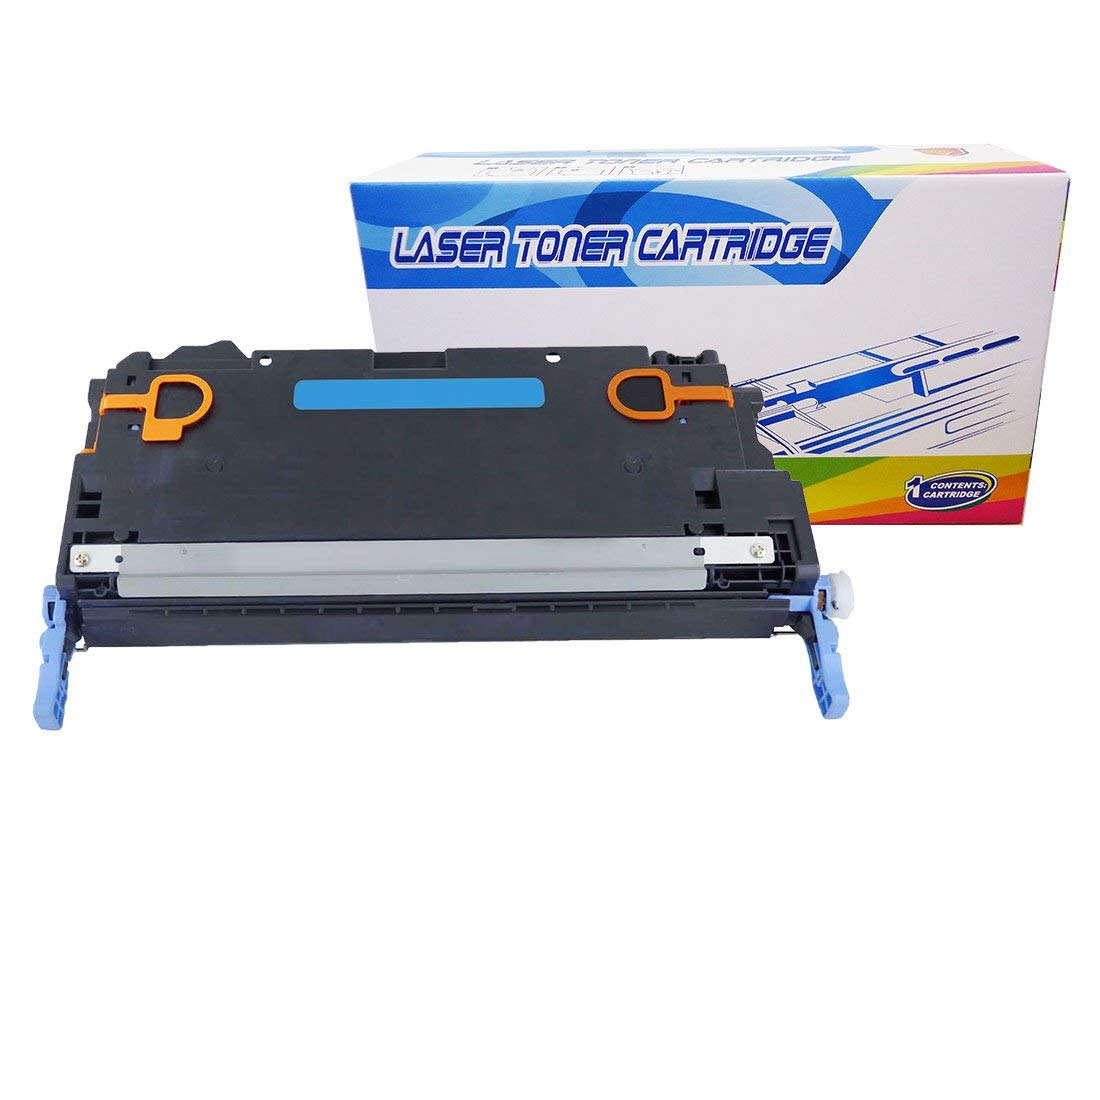 1 Inktoneram Replacement toner cartridge for HP Q6471A 502A Cyan Toner Cartridge 3600 3600dn 3600n